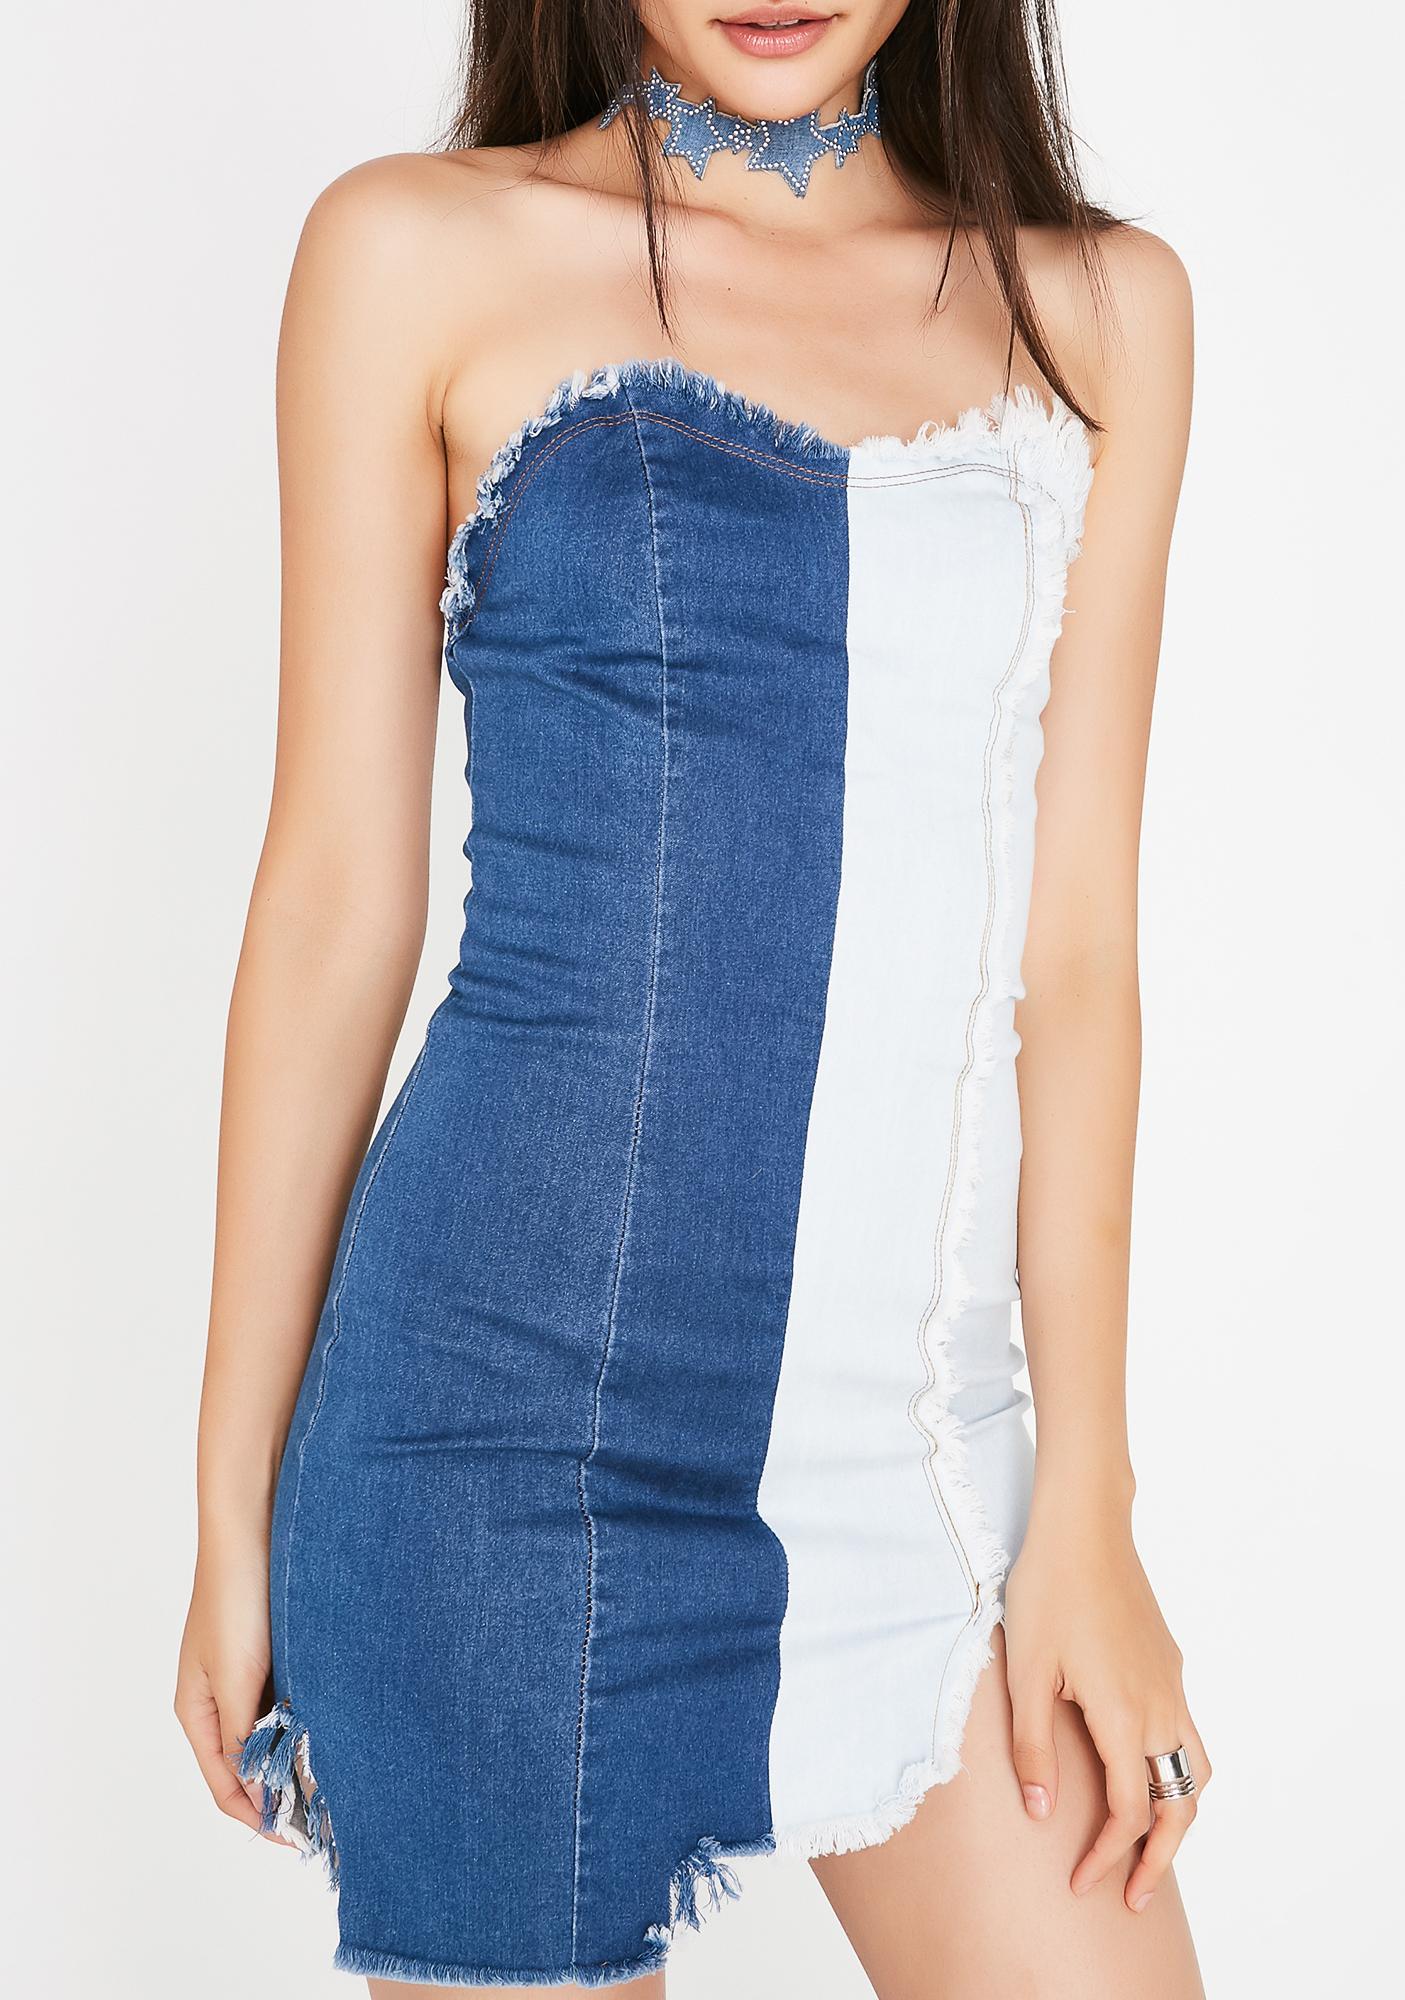 Can't Decide Denim Dress